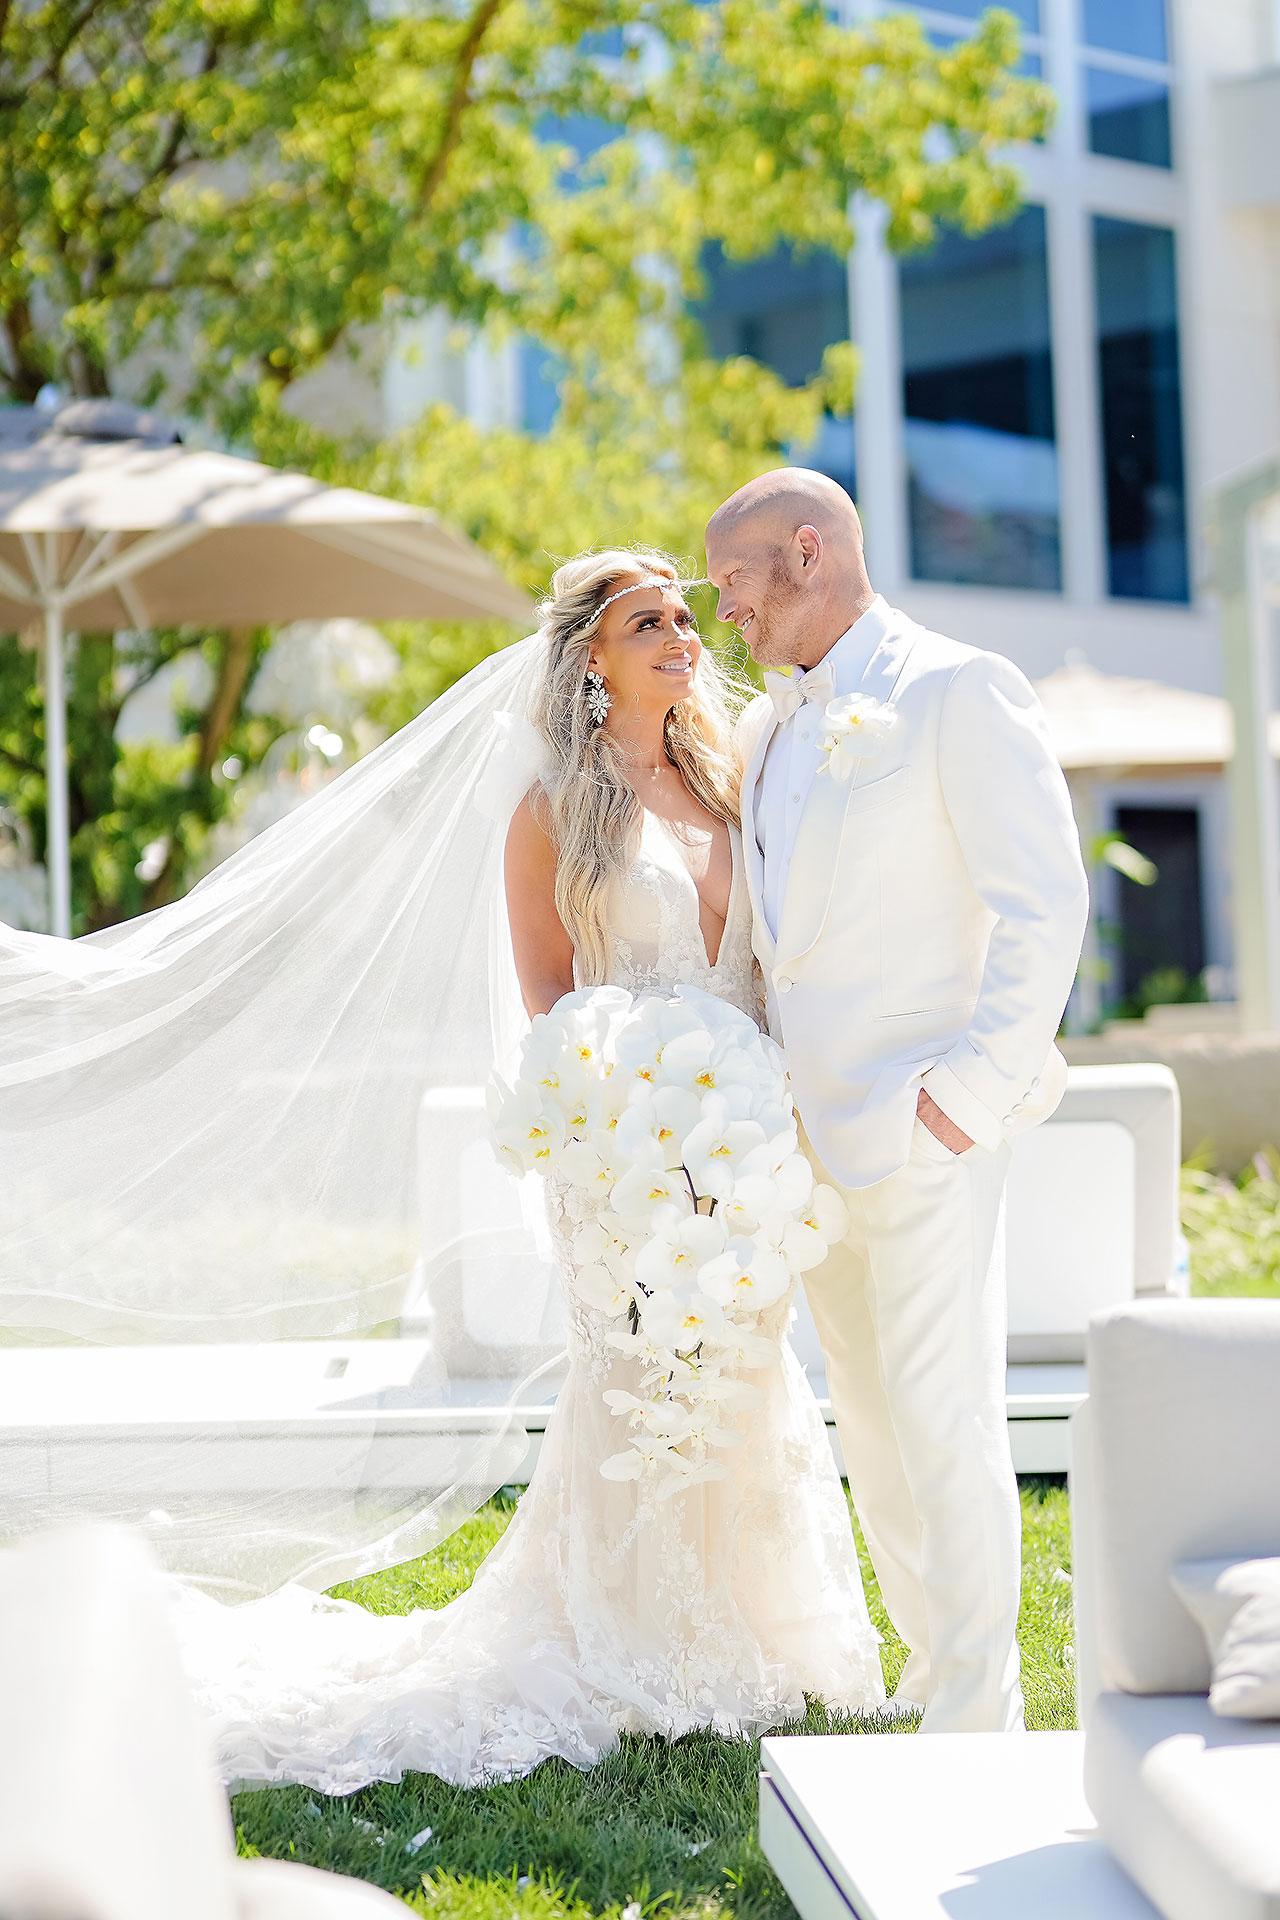 Michelle Al Wedding Ceremony 220